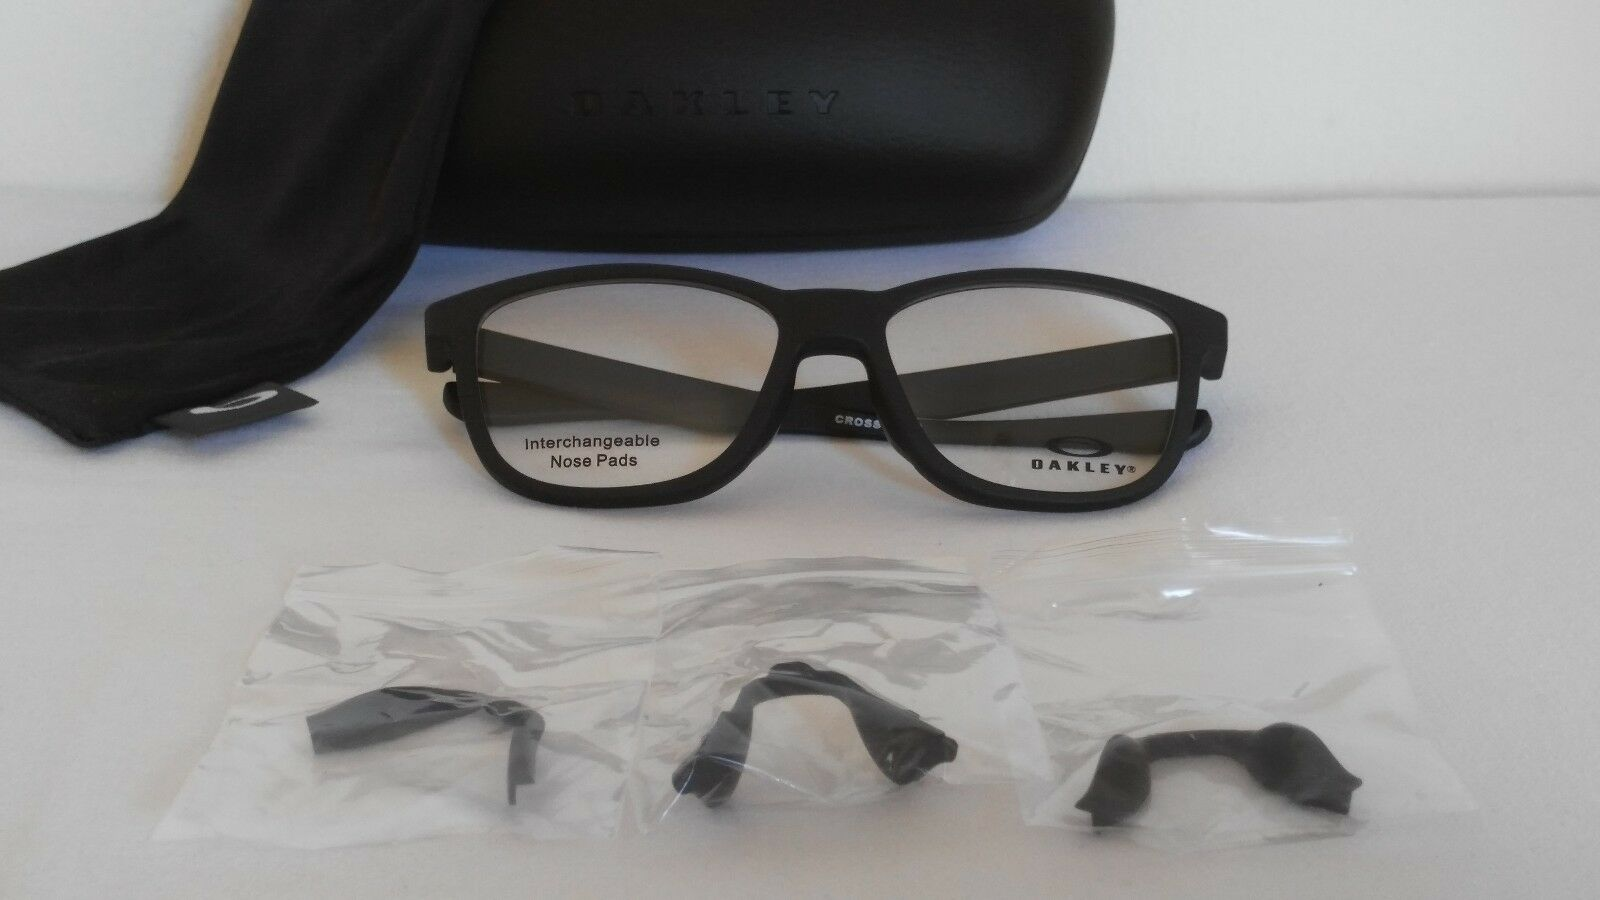 0de3252040d Oakley Ox8106-0152 DESIGNER Eyeglasses Glasses Frames Matte Black